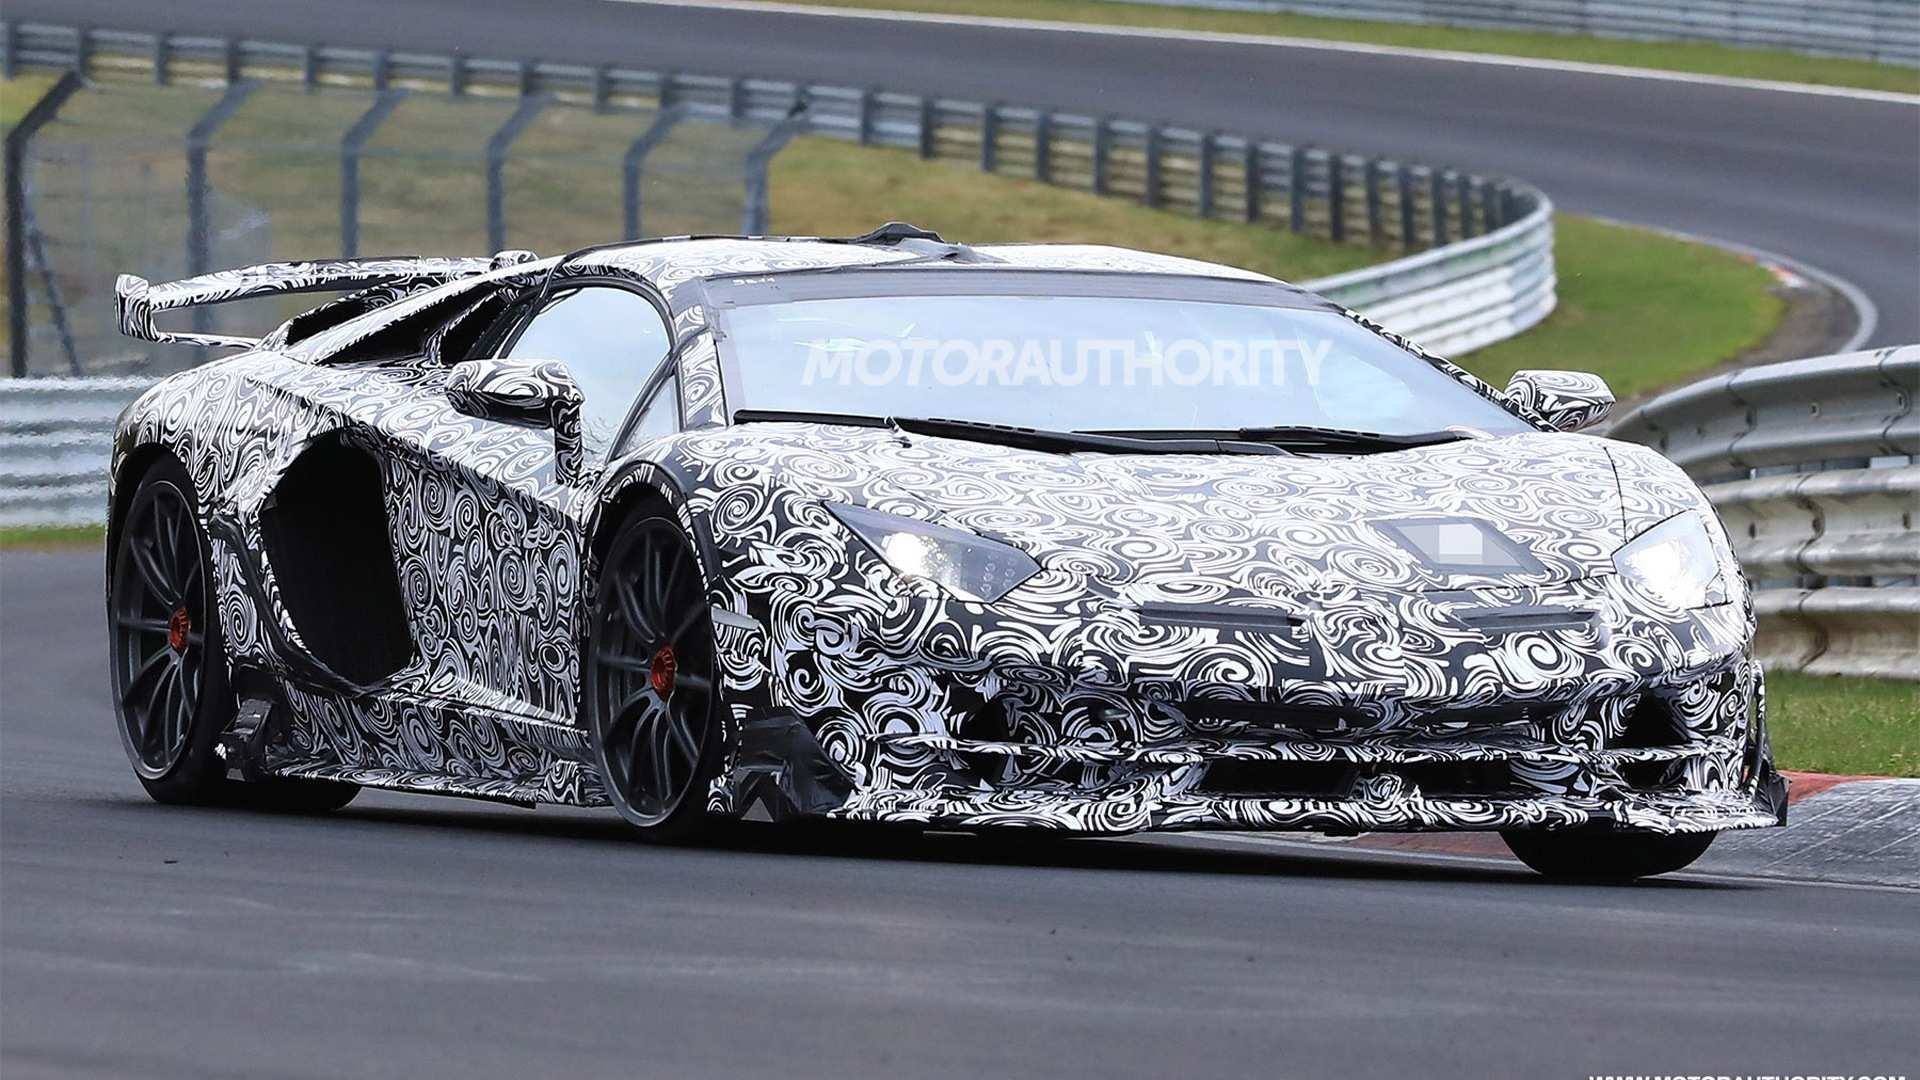 80 New 2020 Lamborghini Svj Performance and New Engine with 2020 Lamborghini Svj